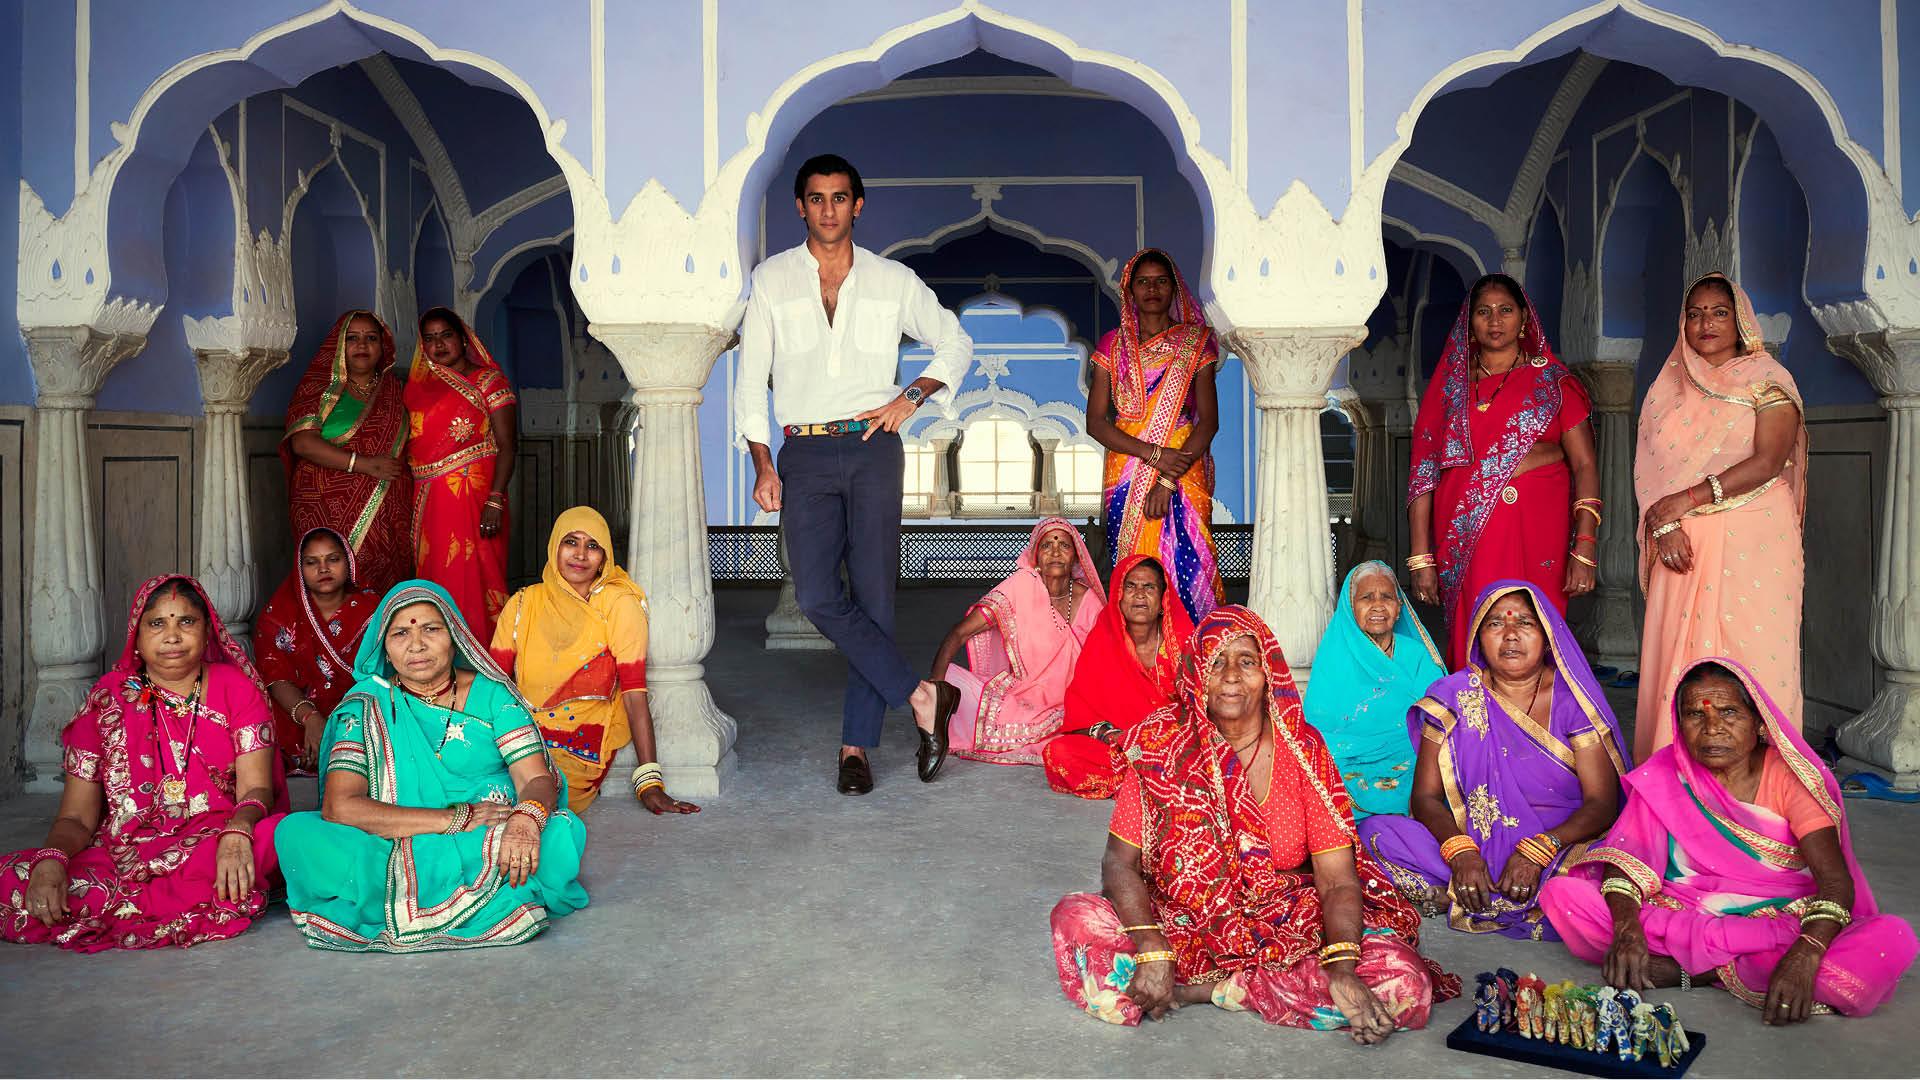 Maharaja Sawai Padmanabh Singh